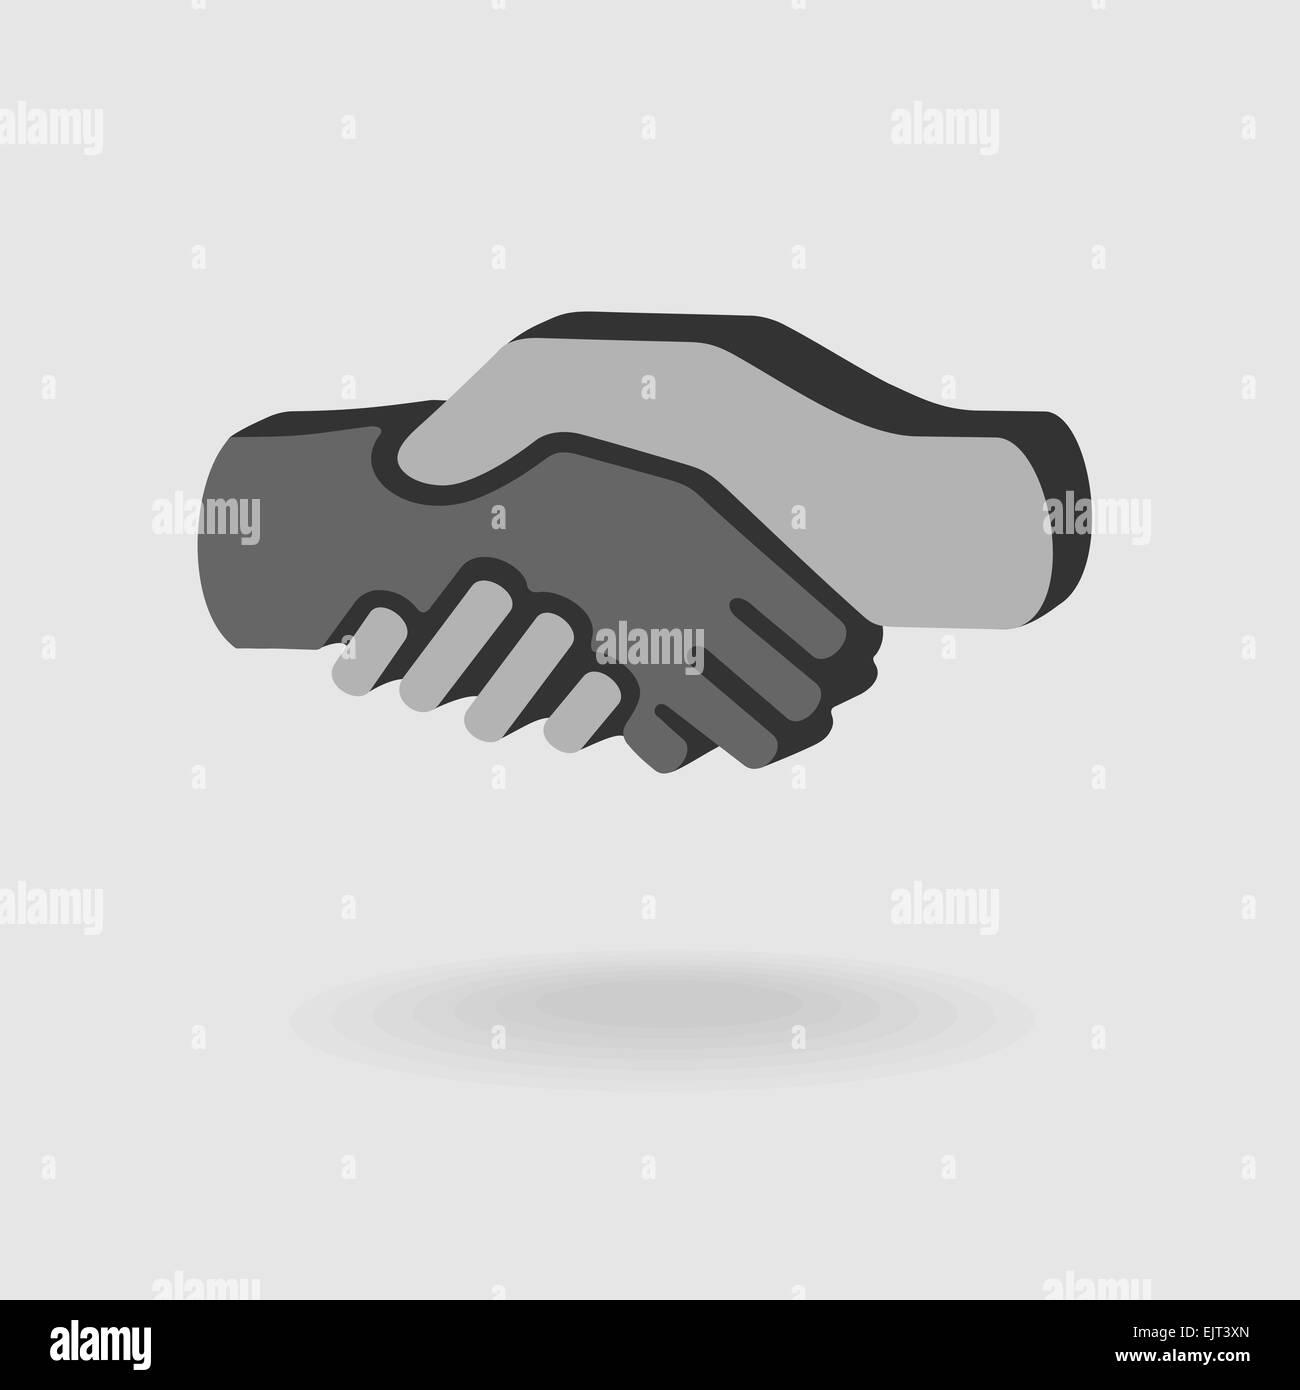 Symbol-Handshake Stockbild